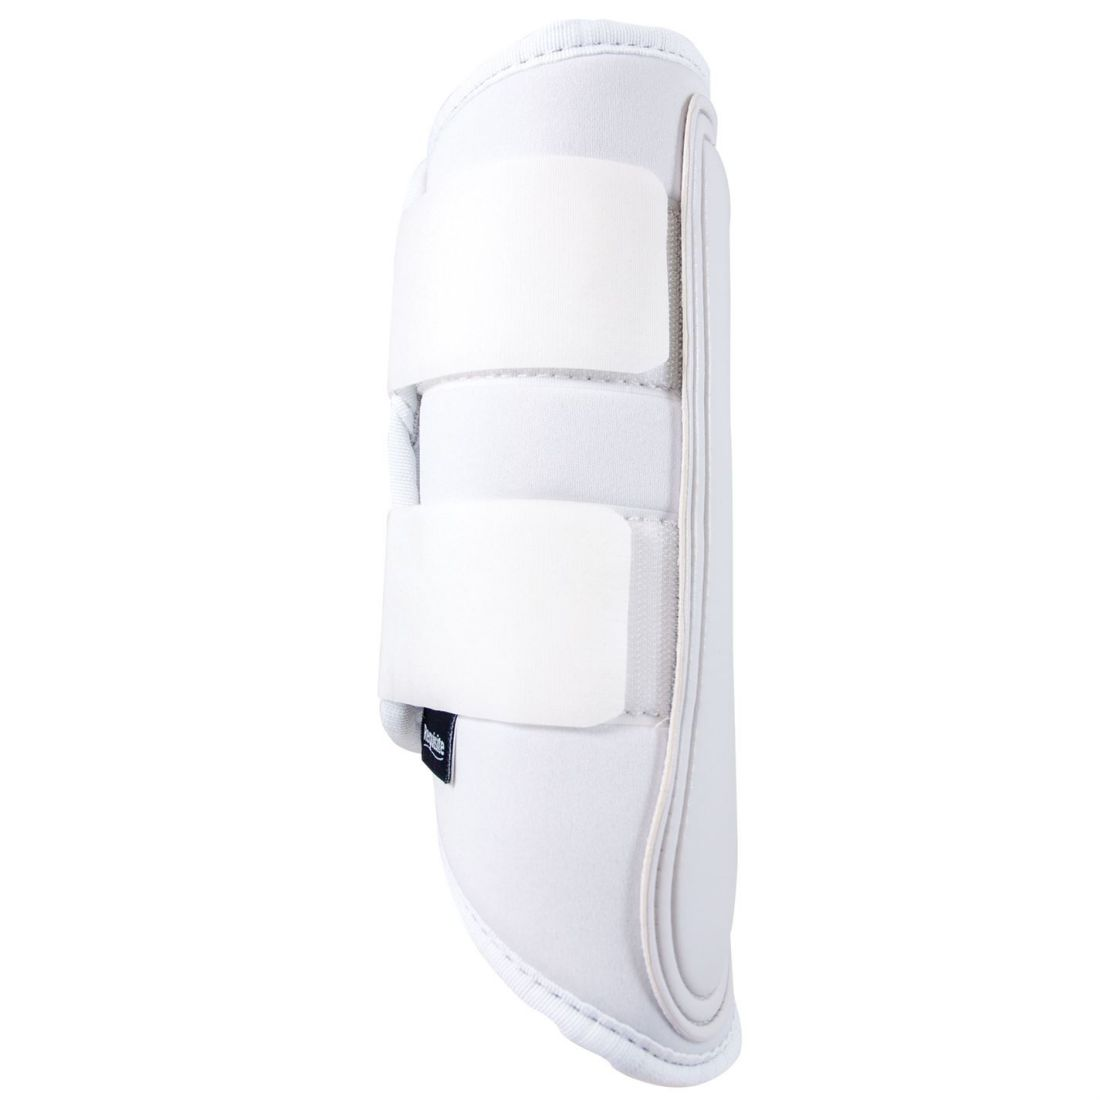 Requisite Unisex Headcollar Adjustable Robinsons New